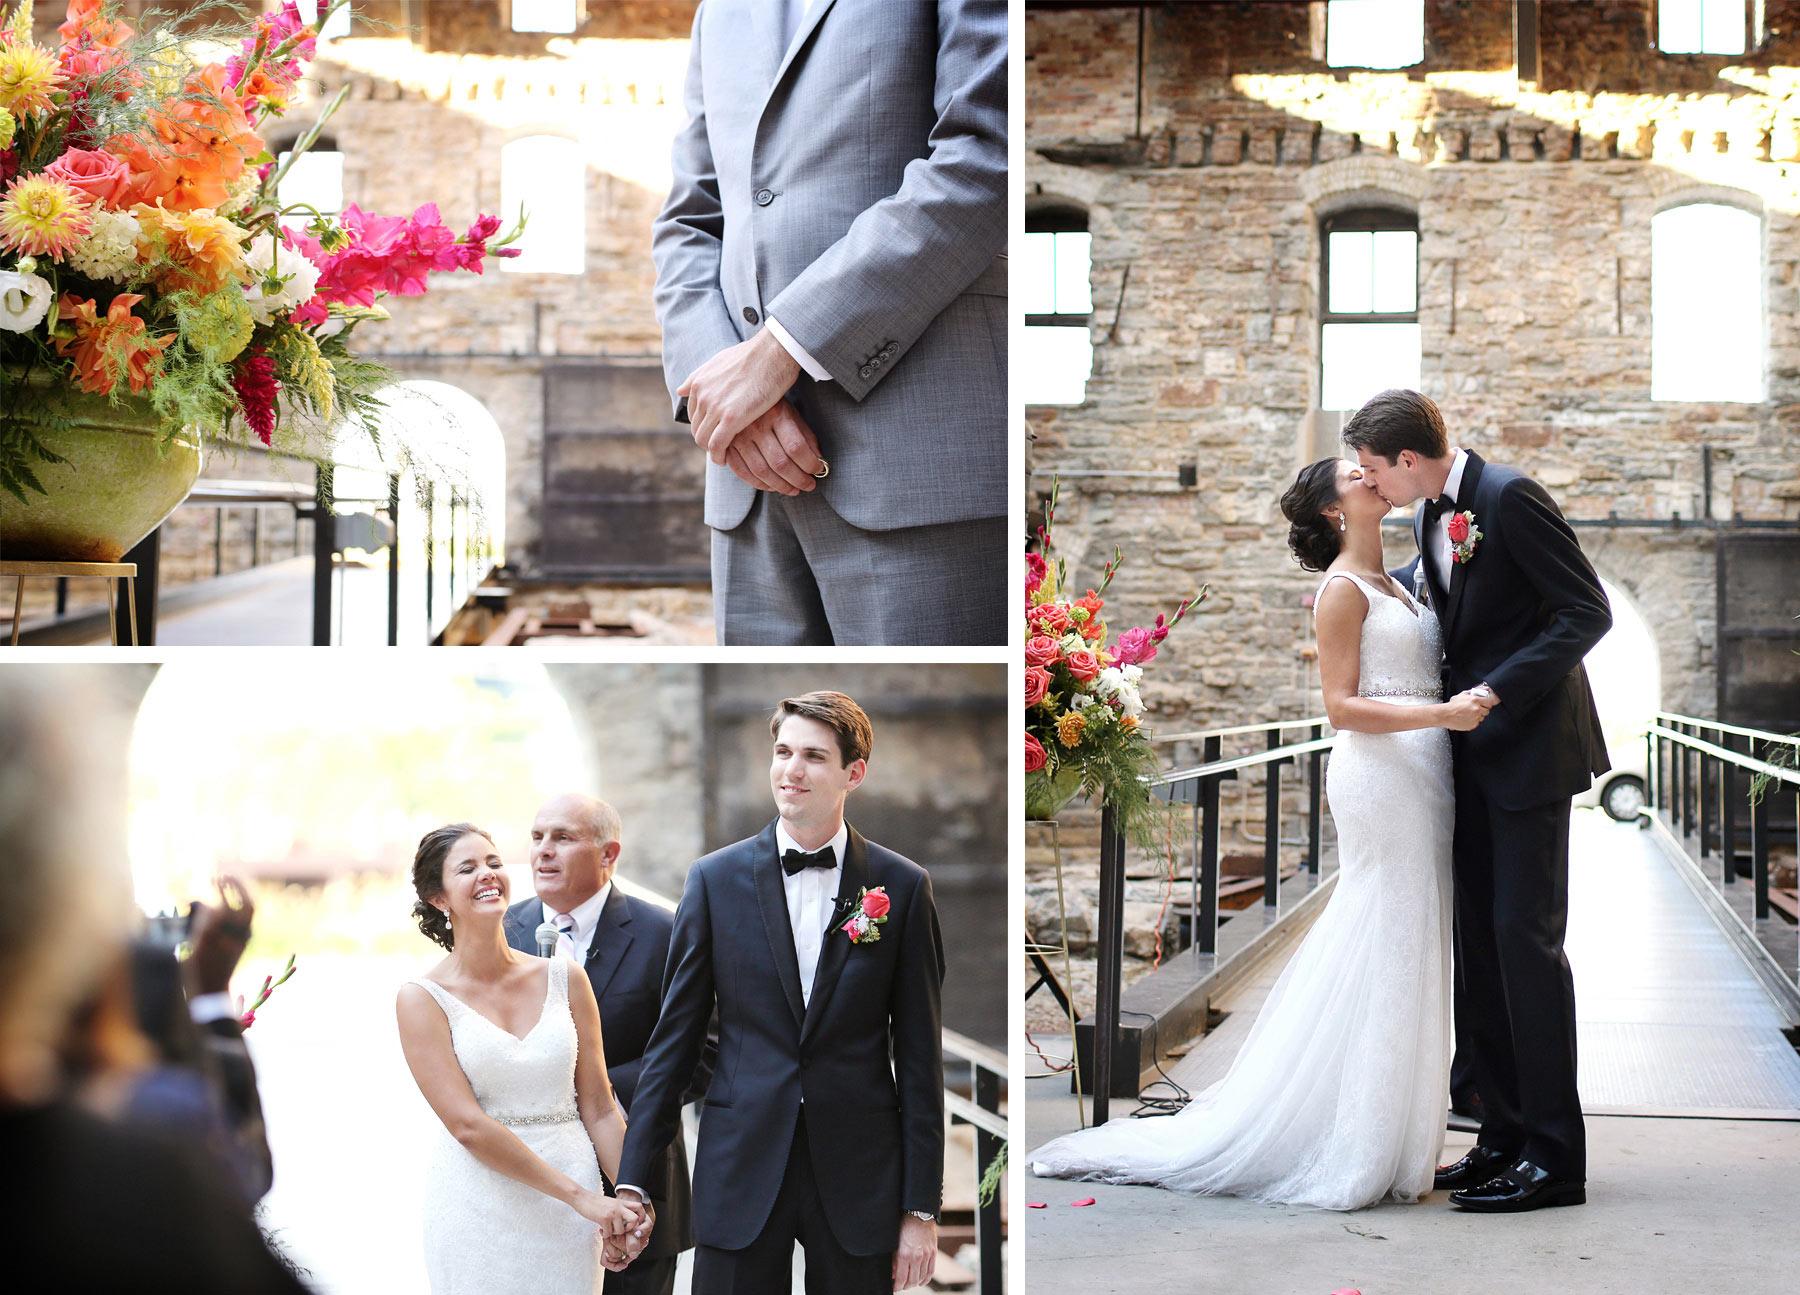 17-Minneapolis-Minnesota-Wedding-Photography-by-Vick-Photography-Downtown-Mill-City-Museum-Ceremony-Outdoor-Wedding-Lalu-&-John.jpg